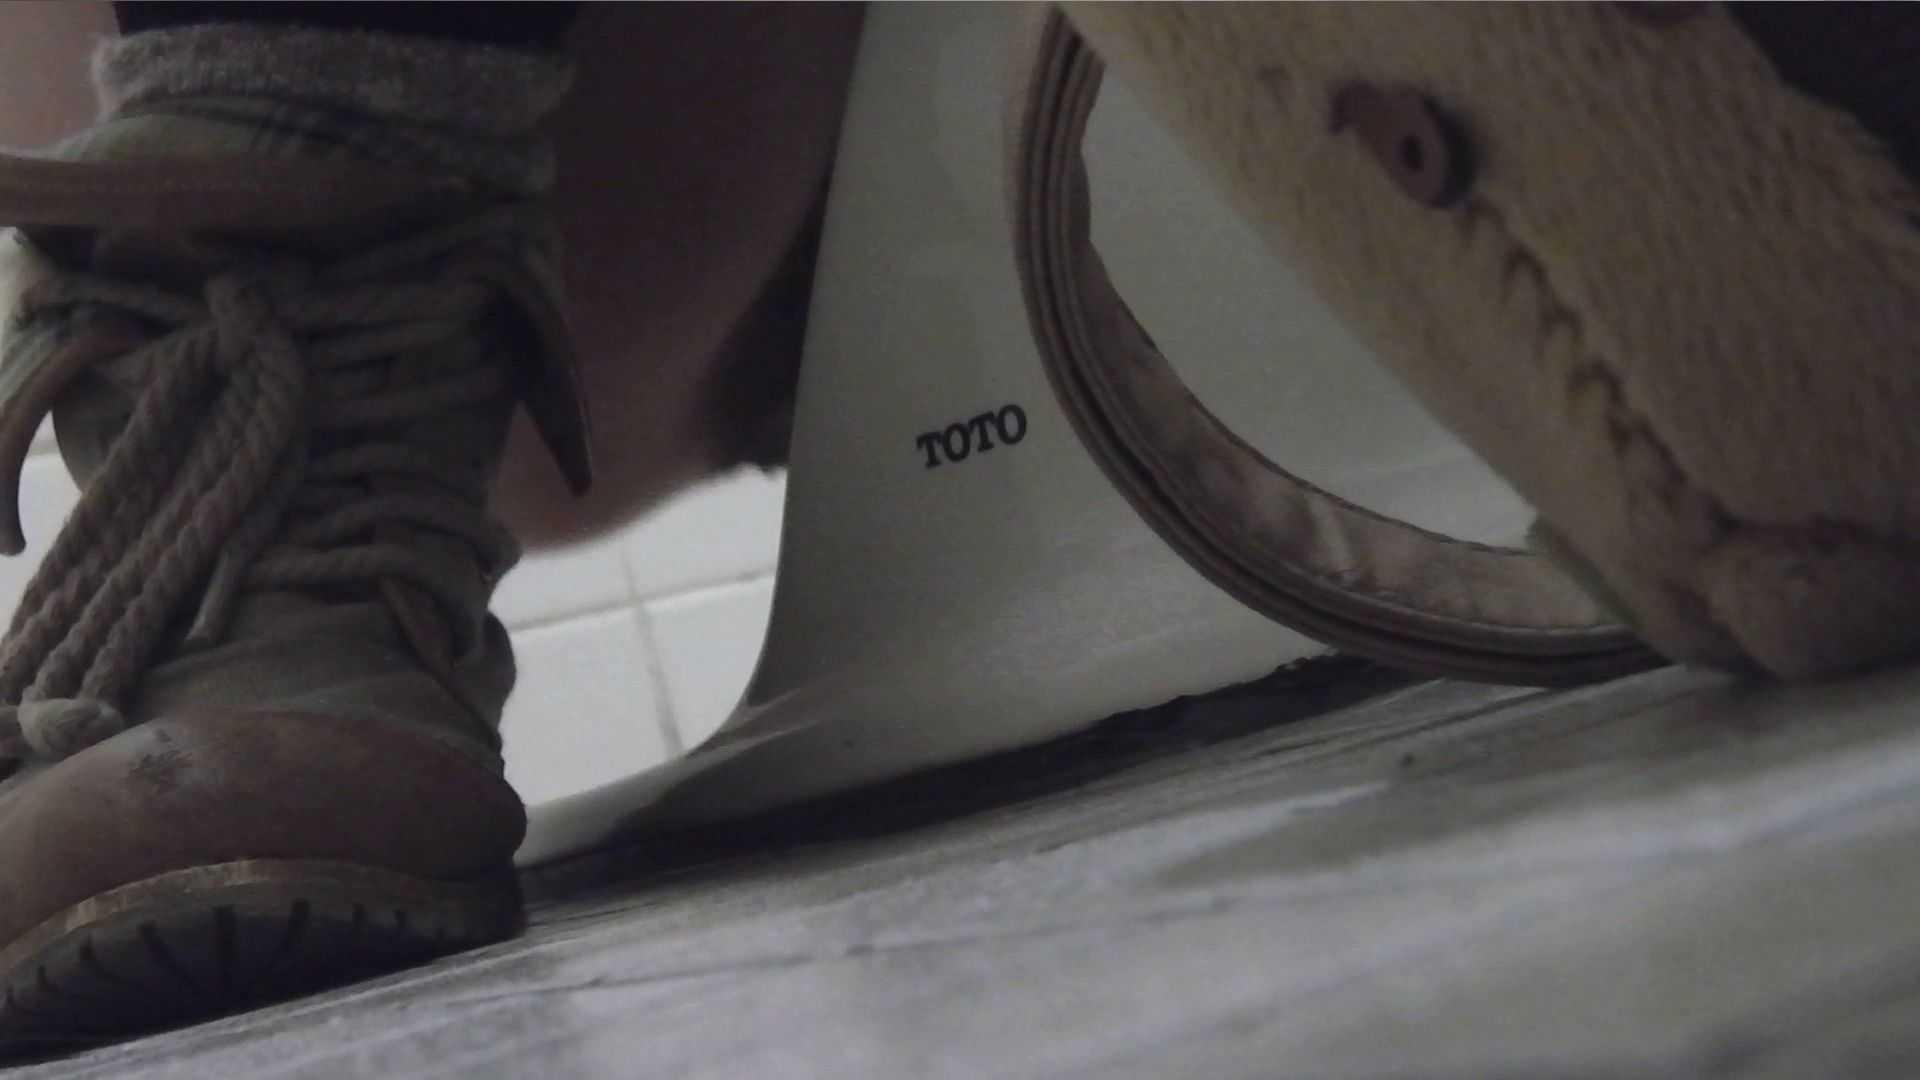 vol.08 命がけ潜伏洗面所! 黒ストッキングが流行りです。 プライベート AV無料動画キャプチャ 95pic 23